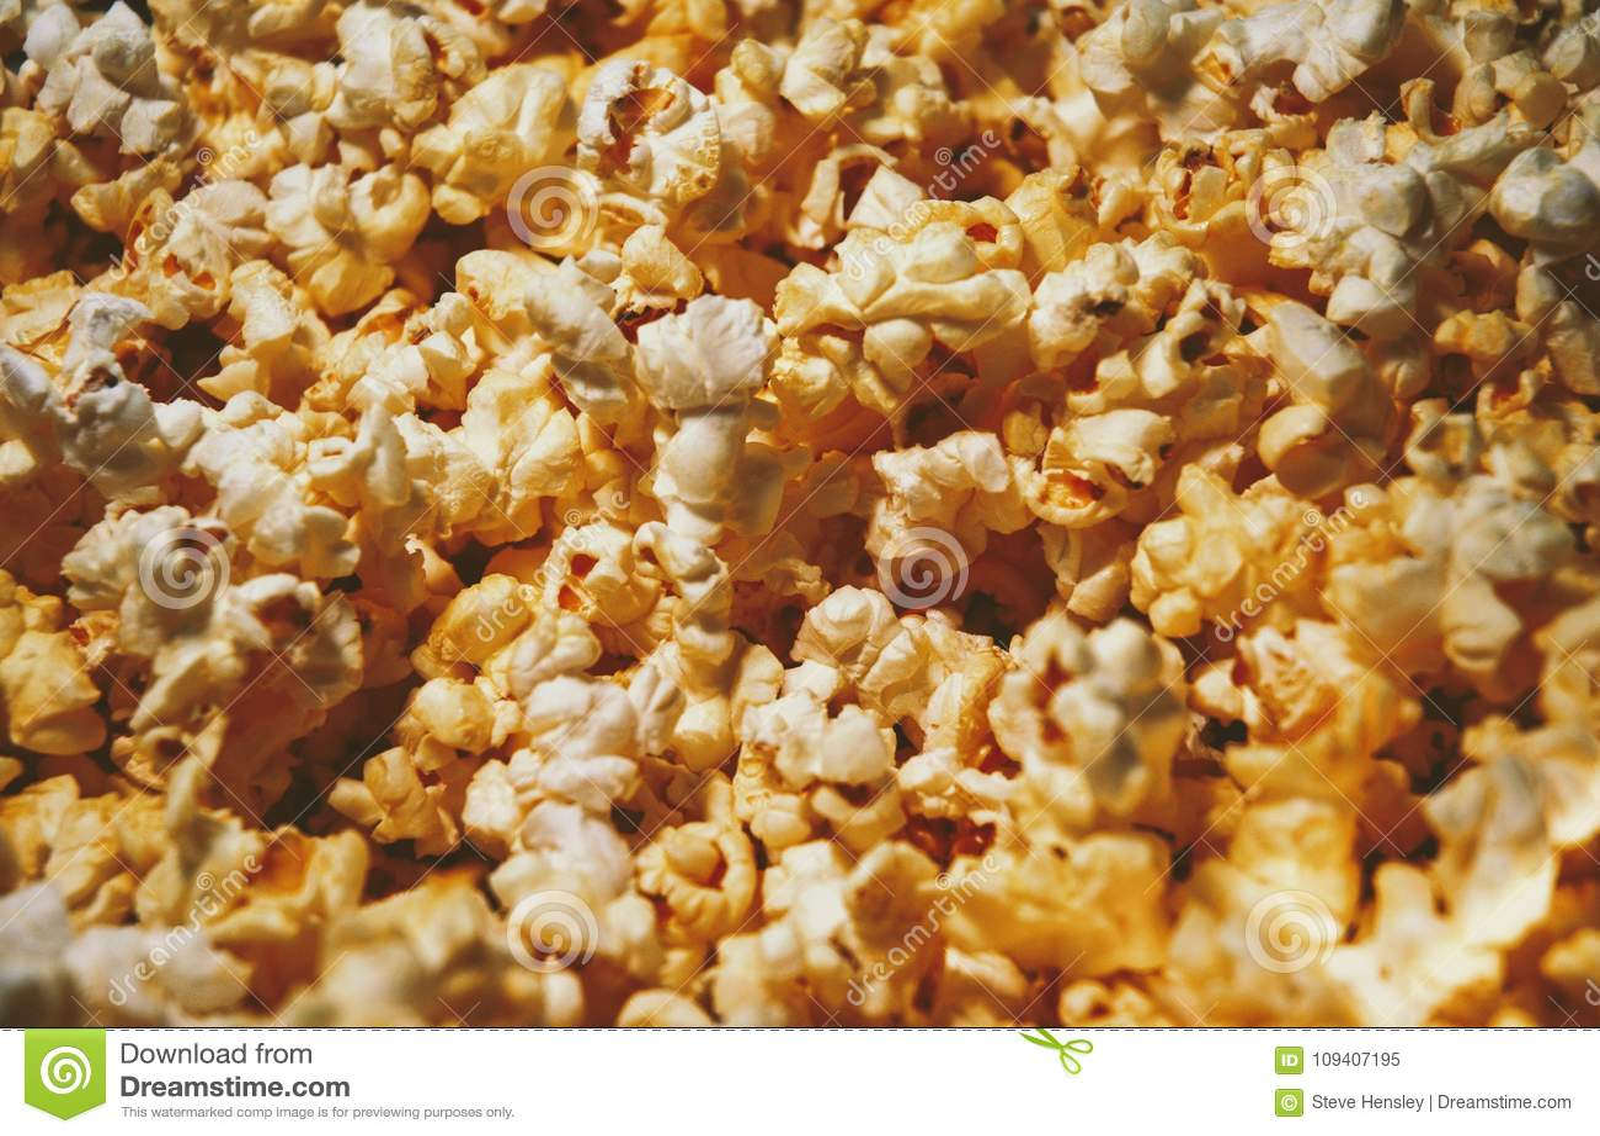 A Closeup Of Butter Popcorn Background Wallpaper Stock